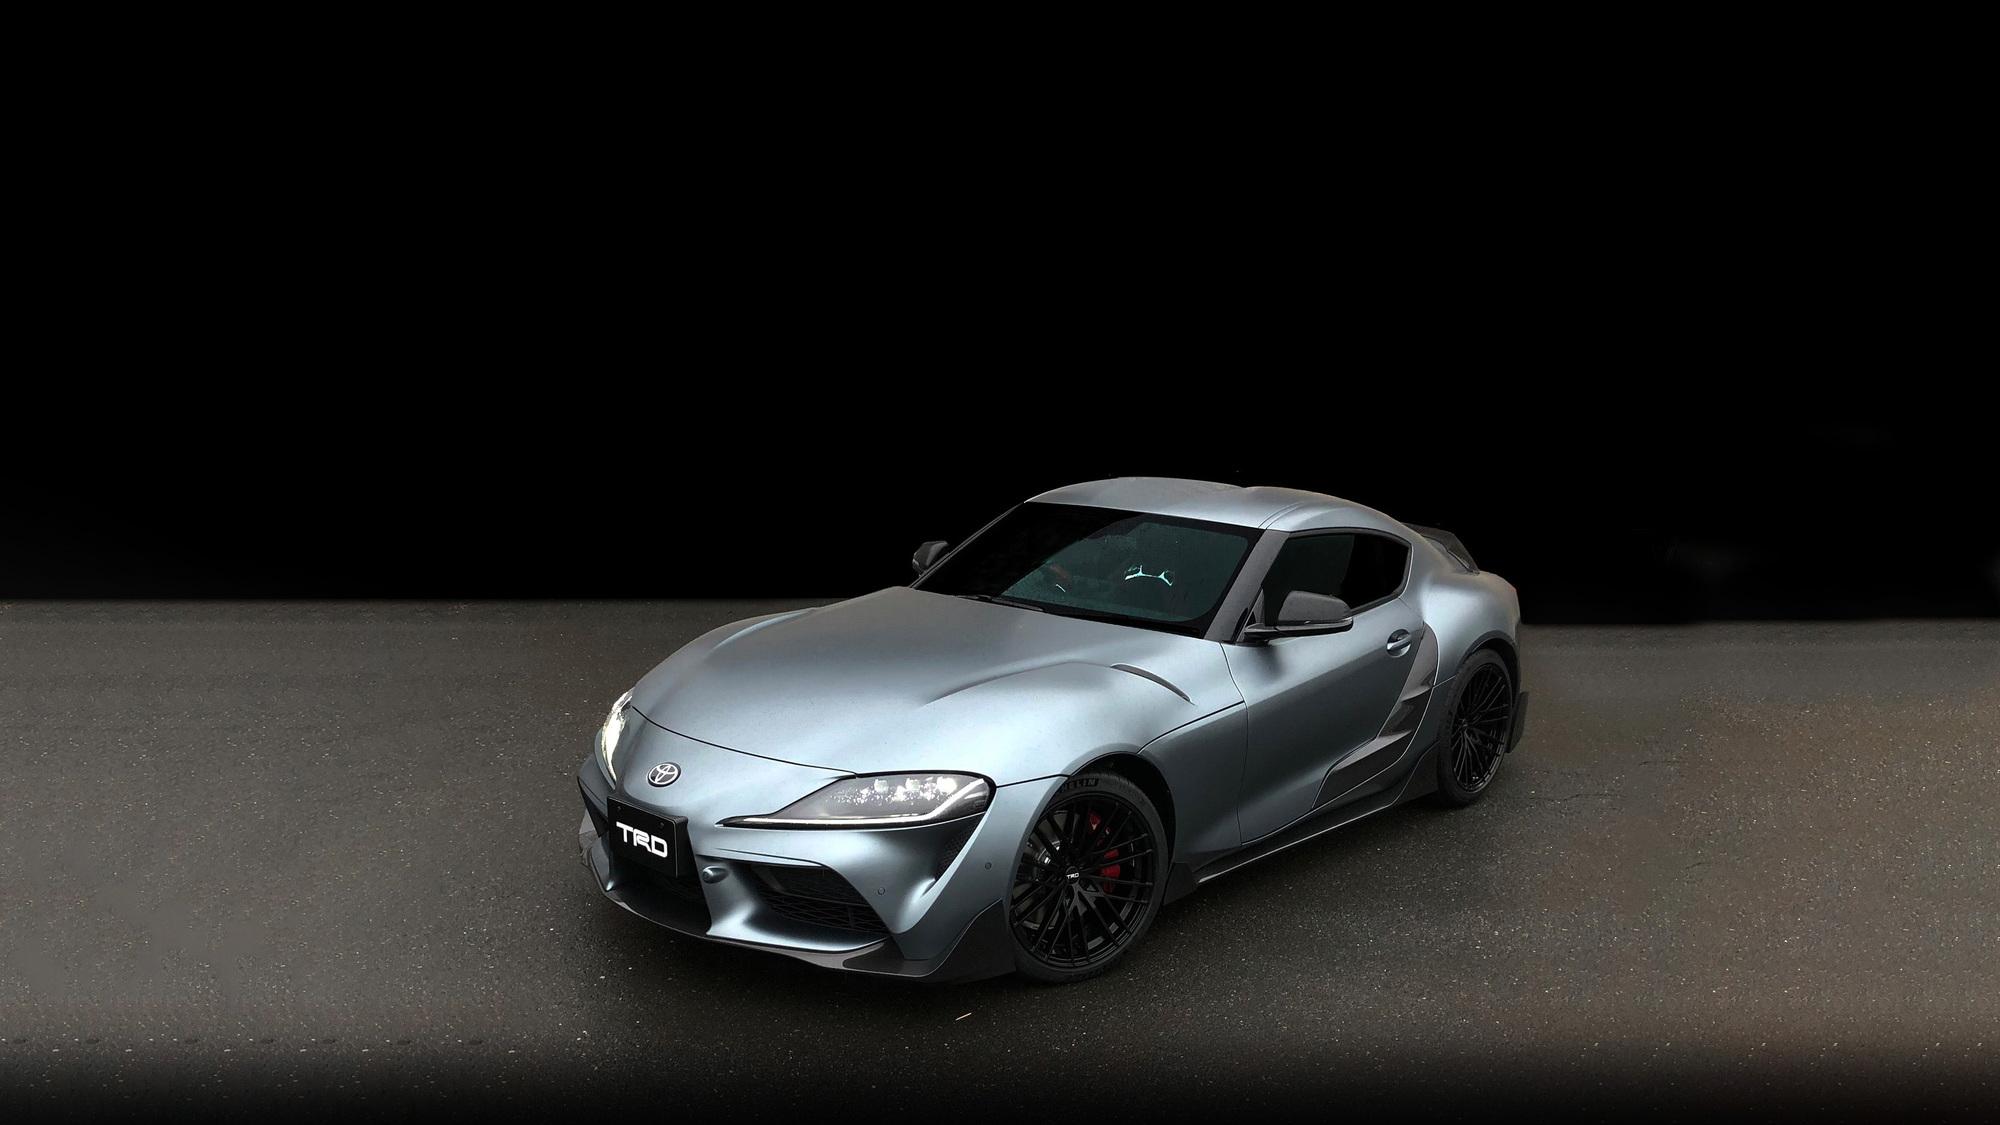 2020 Toyota Supra TRD concept (Edit)